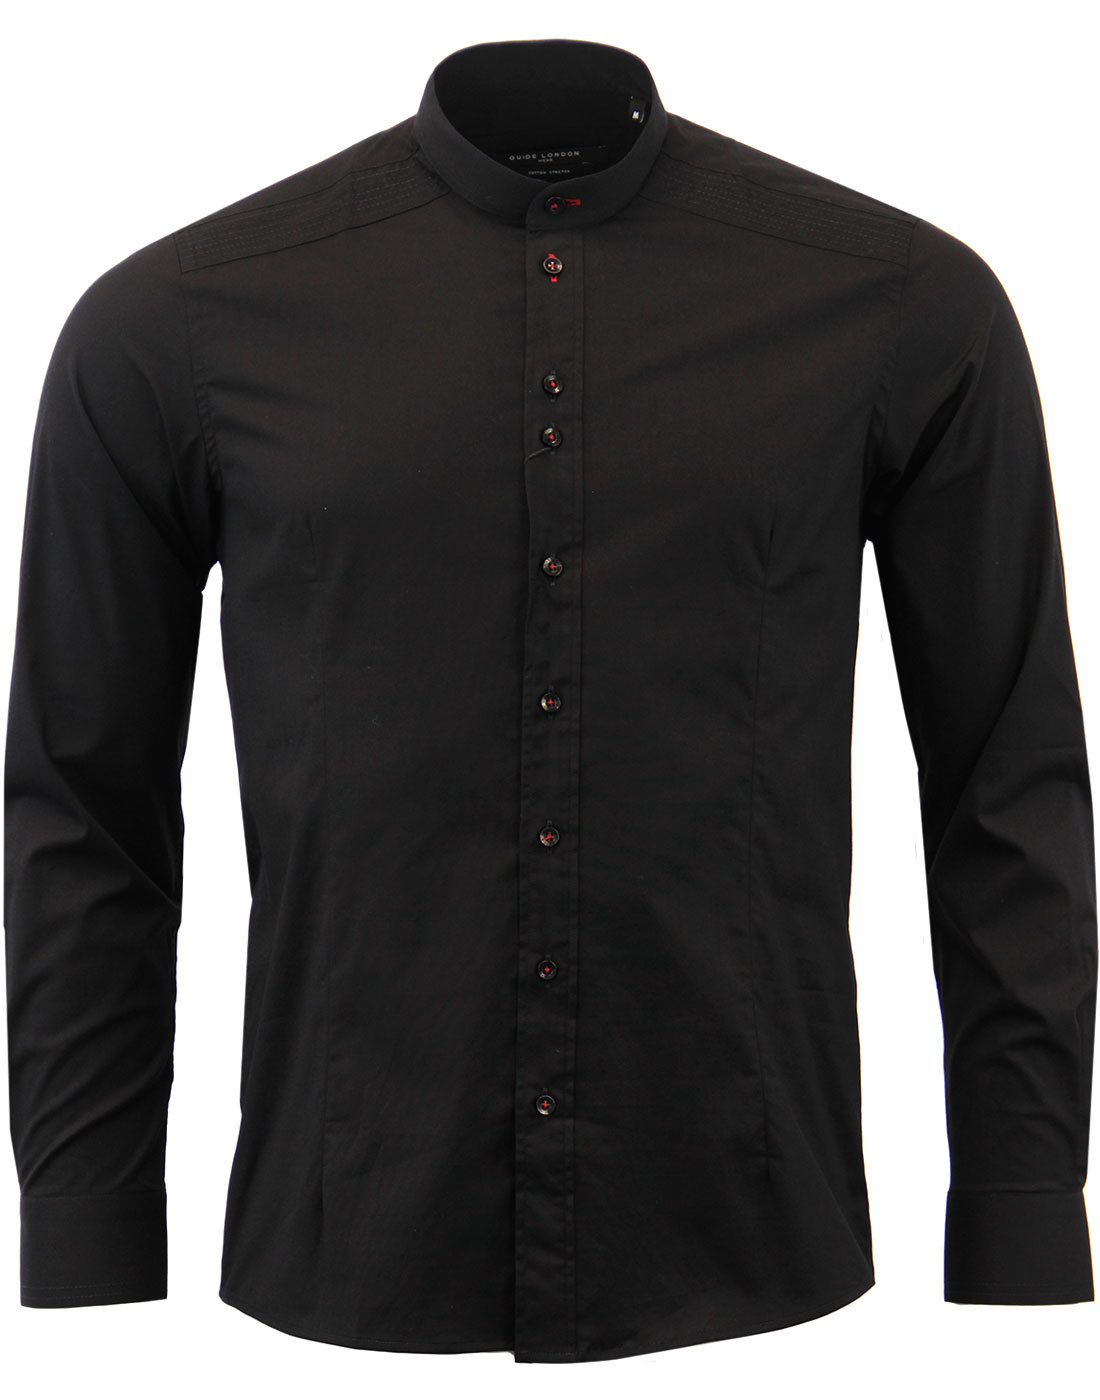 GUIDE LONDON 60s Mod Smart Grandad Shirt BLACK